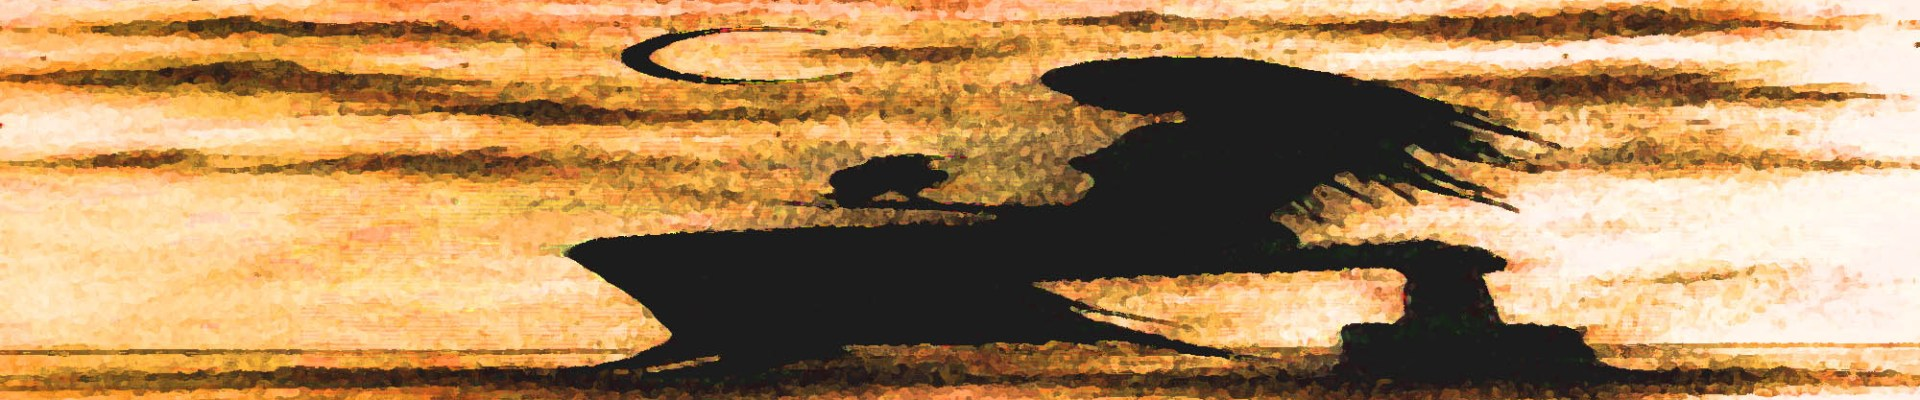 Exploring Worlds of the Dark Feminine with Brigid Burke